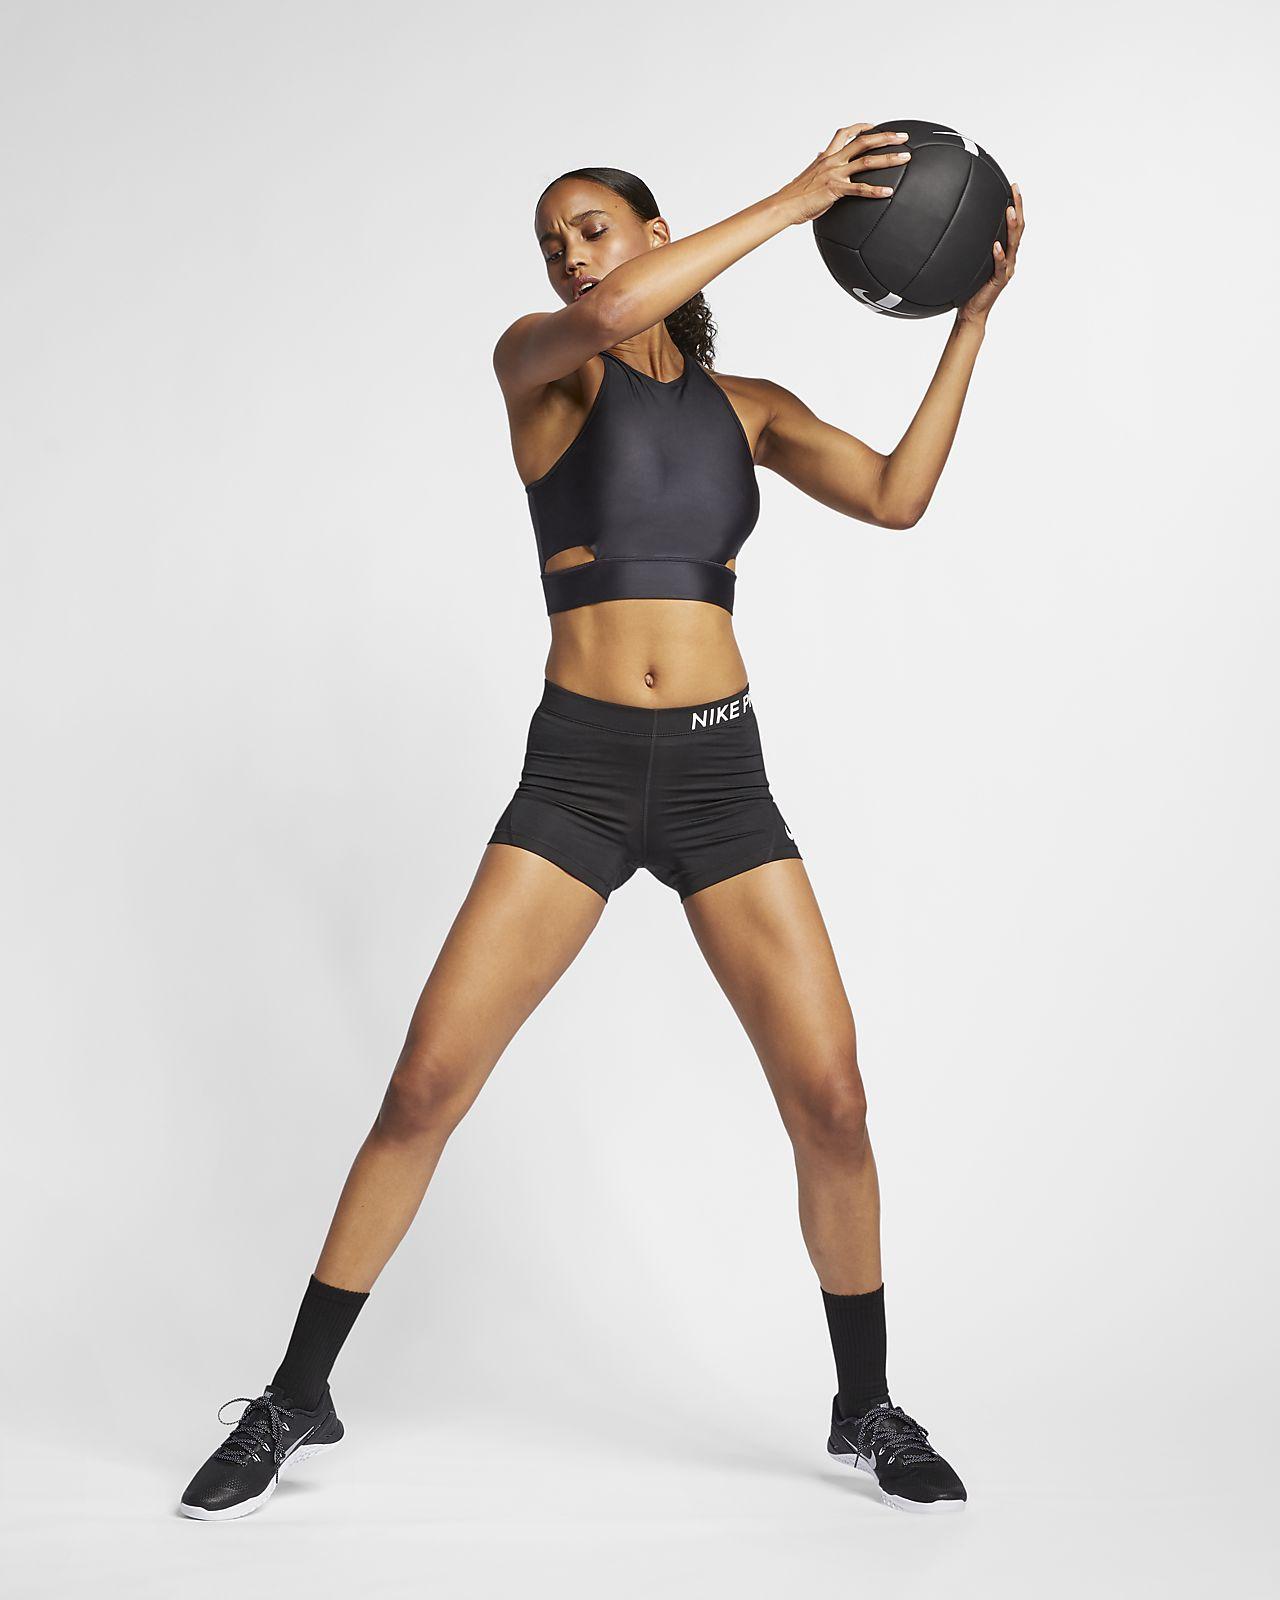 56e2fff4f65eba Nike Trainings-Kurz-Tanktop für Damen. Nike.com AT